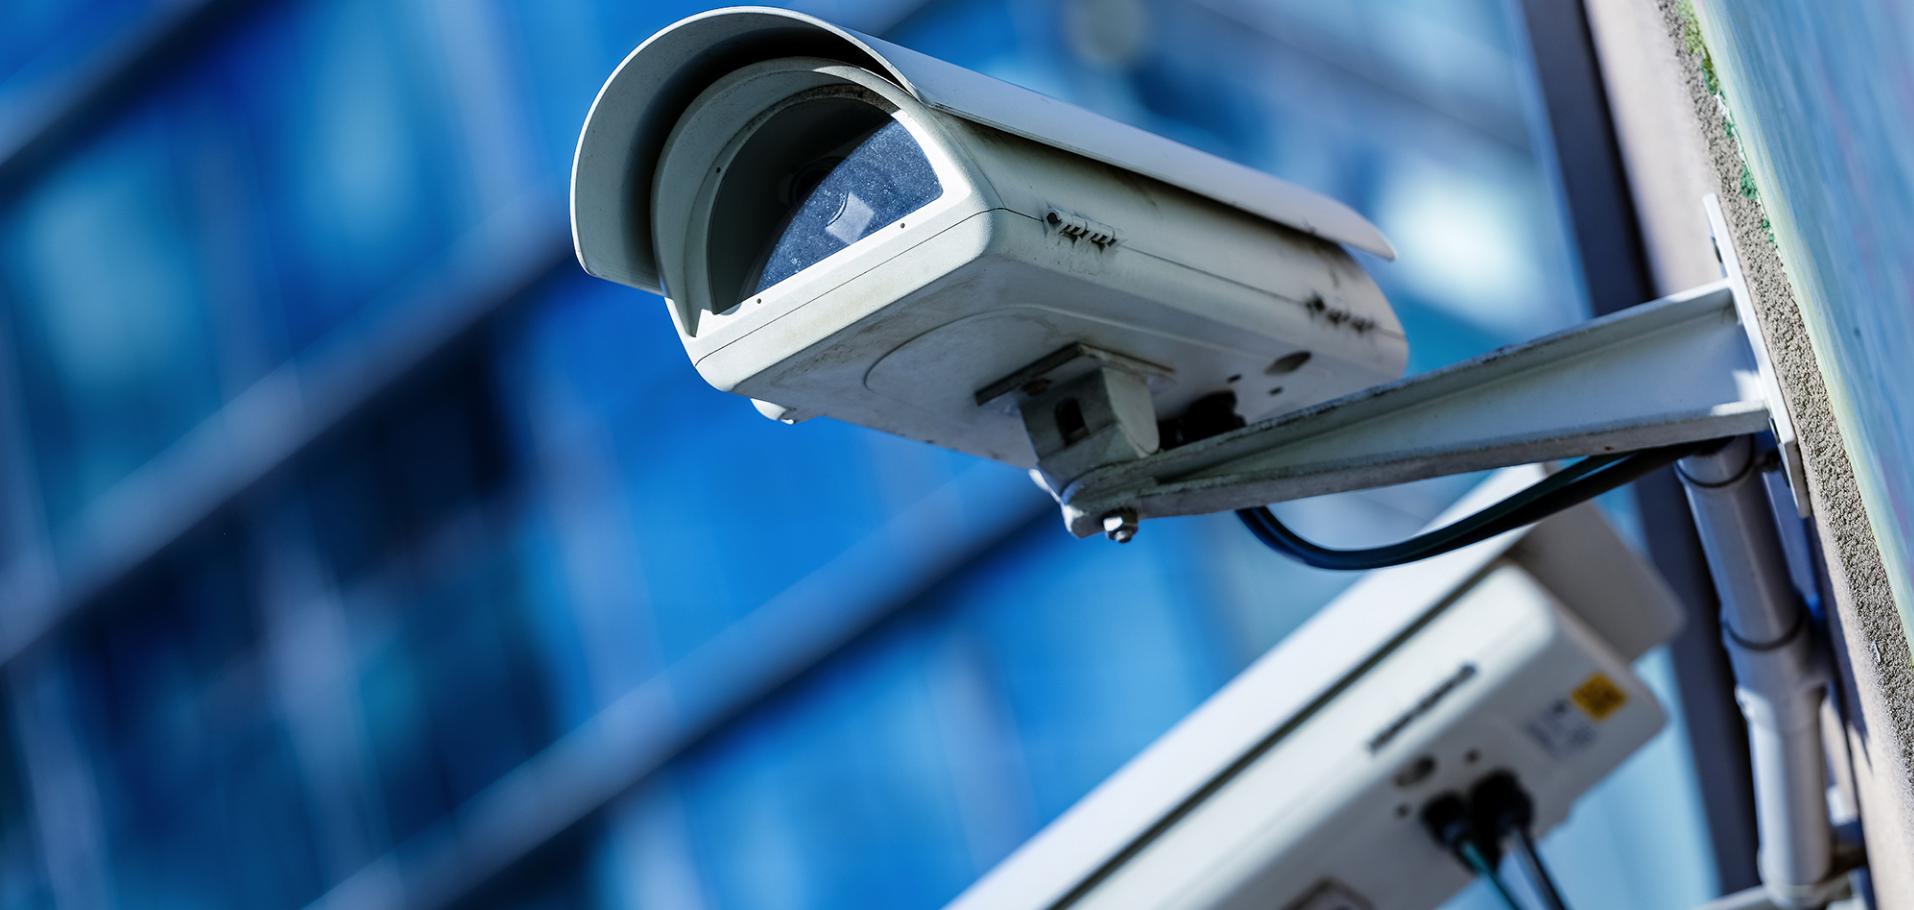 bigstock-Security-Camera-And-Urban-Vide-61811687low_edited.jpg